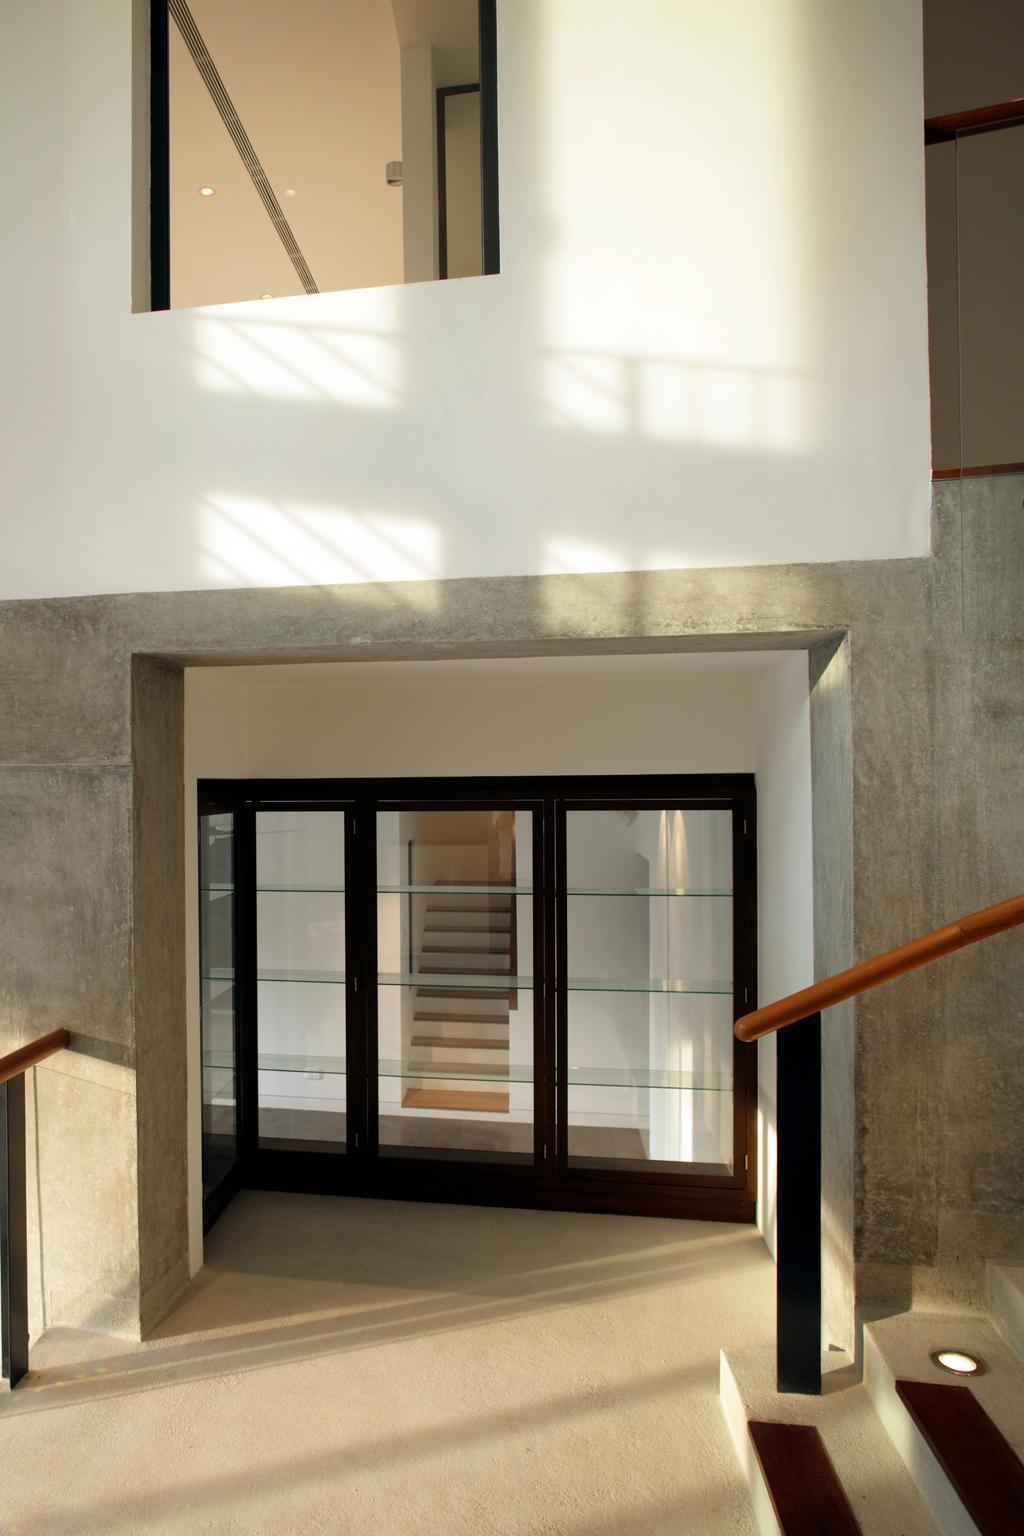 Modern, Landed, Belmont House, Architect, Lekker Architects, Concrete Walls, Transparent Doors, Glass Railing, Stairway, Banister, Handrail